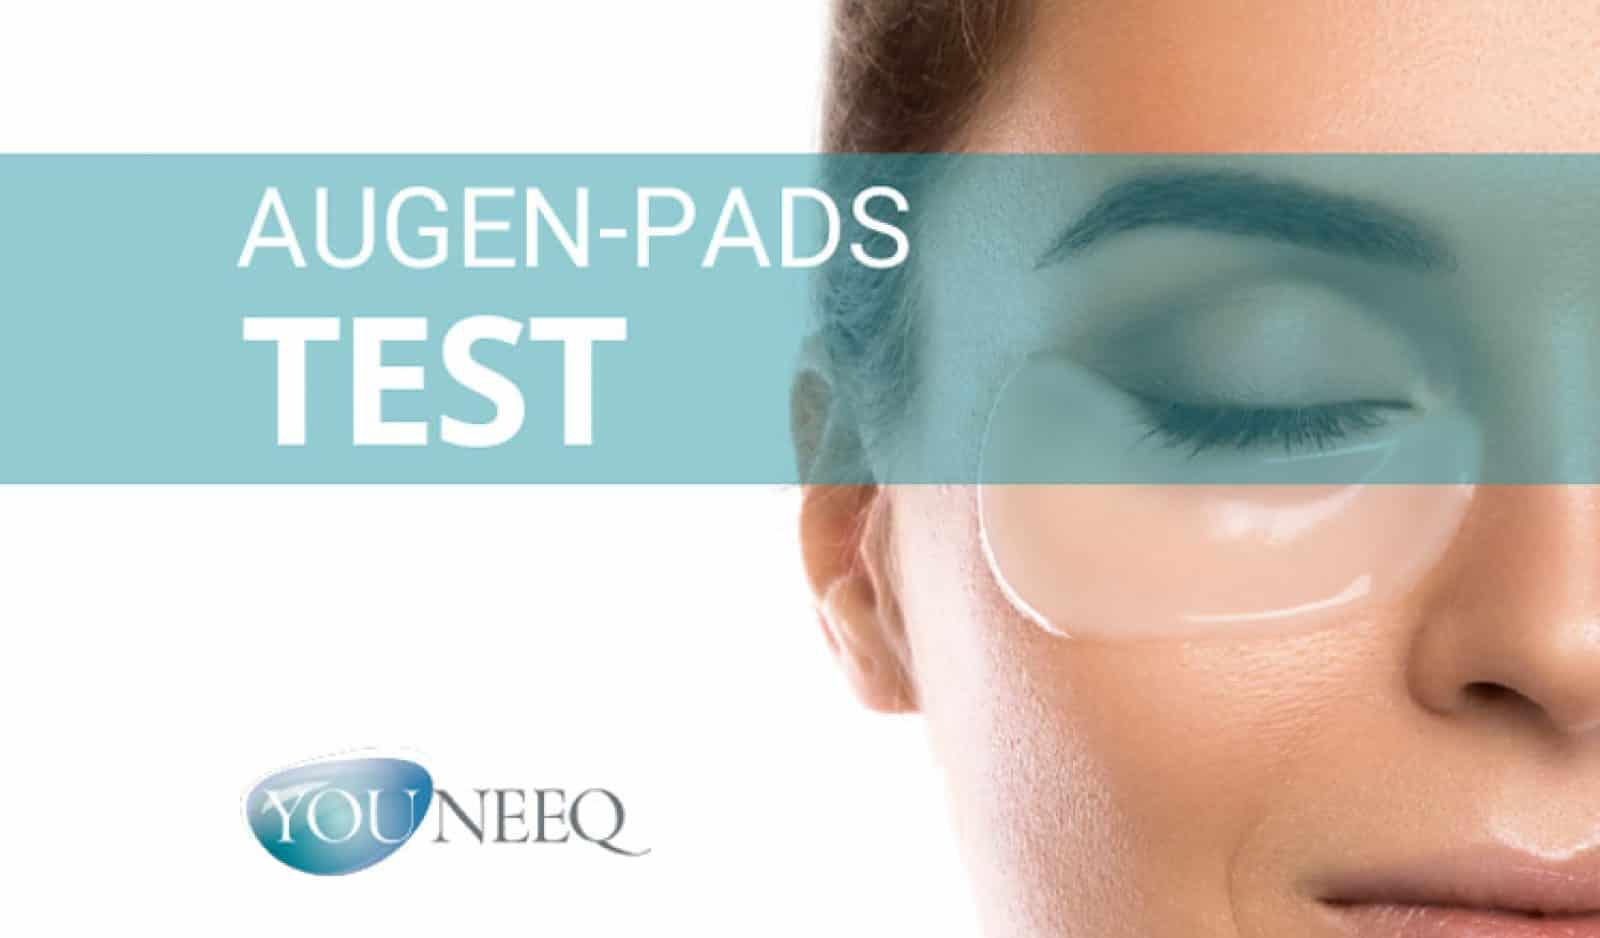 Augenpads Test